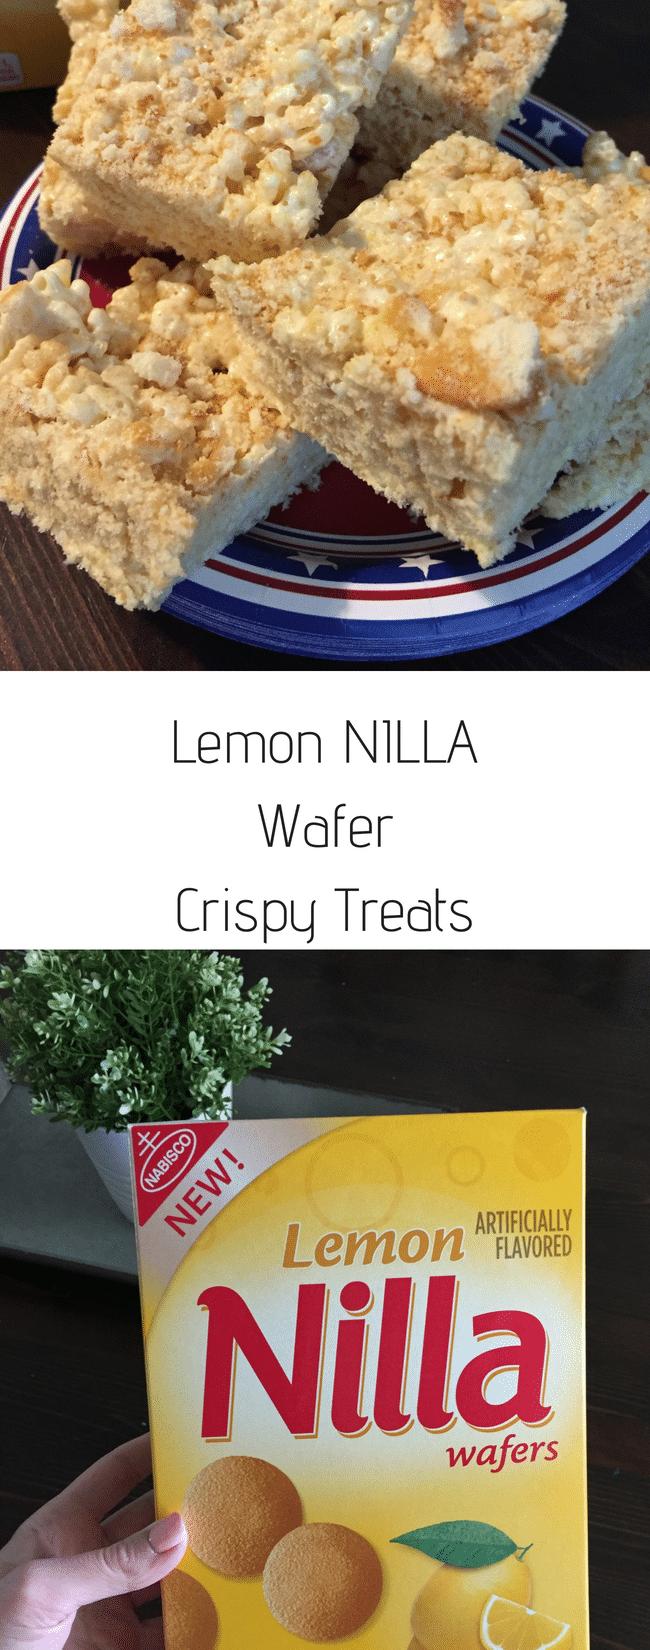 You'll love these Crispy Treats using Lemon NILLA Wafers! #NILLASummerParty, #IC #ad via @clarkscondensed